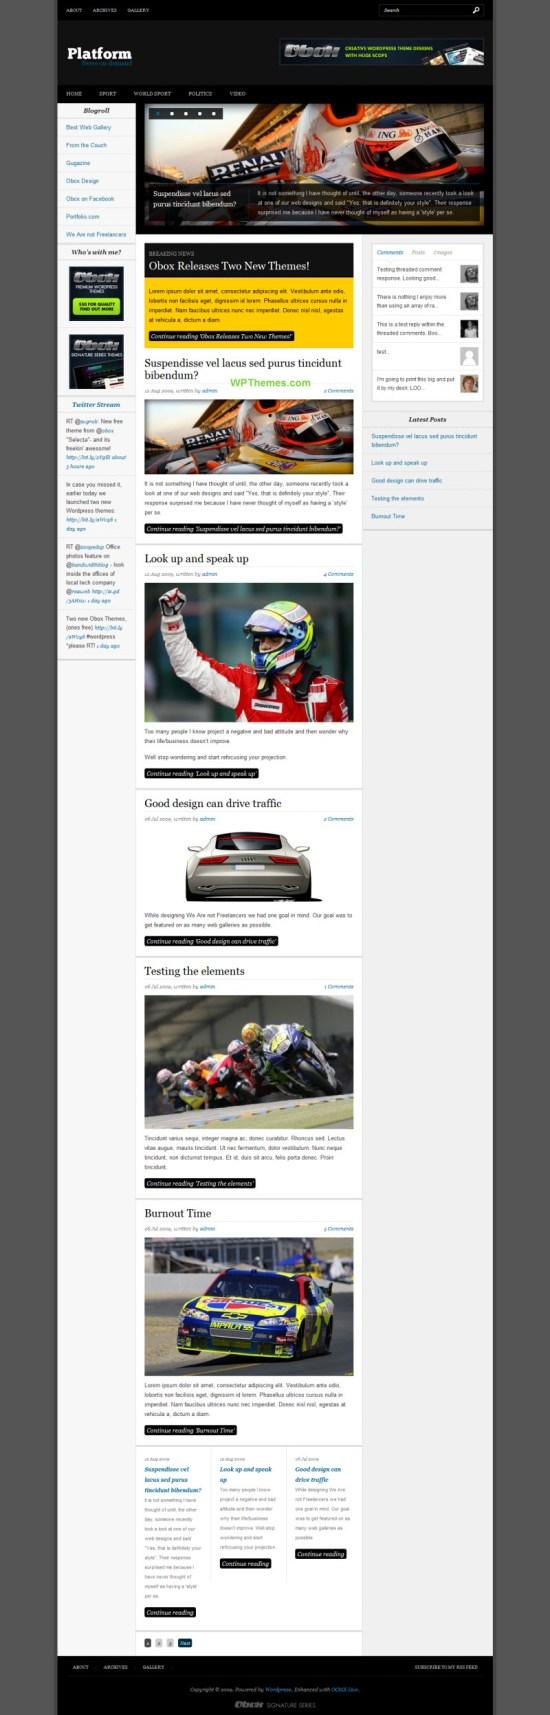 OboxDesign-Platform-Magazine-Theme-Reduced